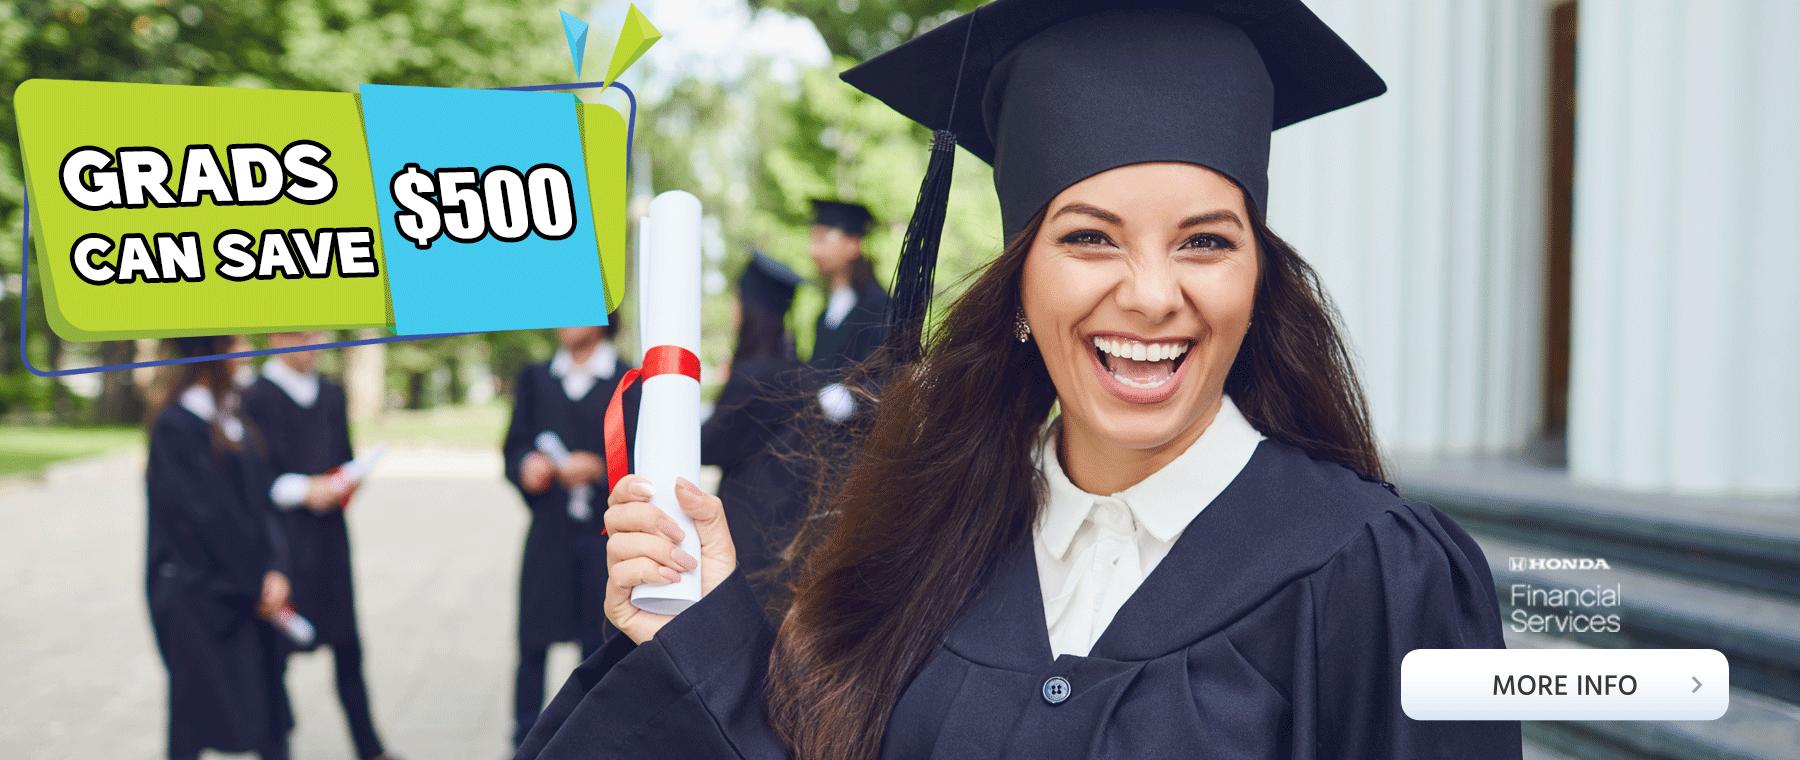 500 college grab program